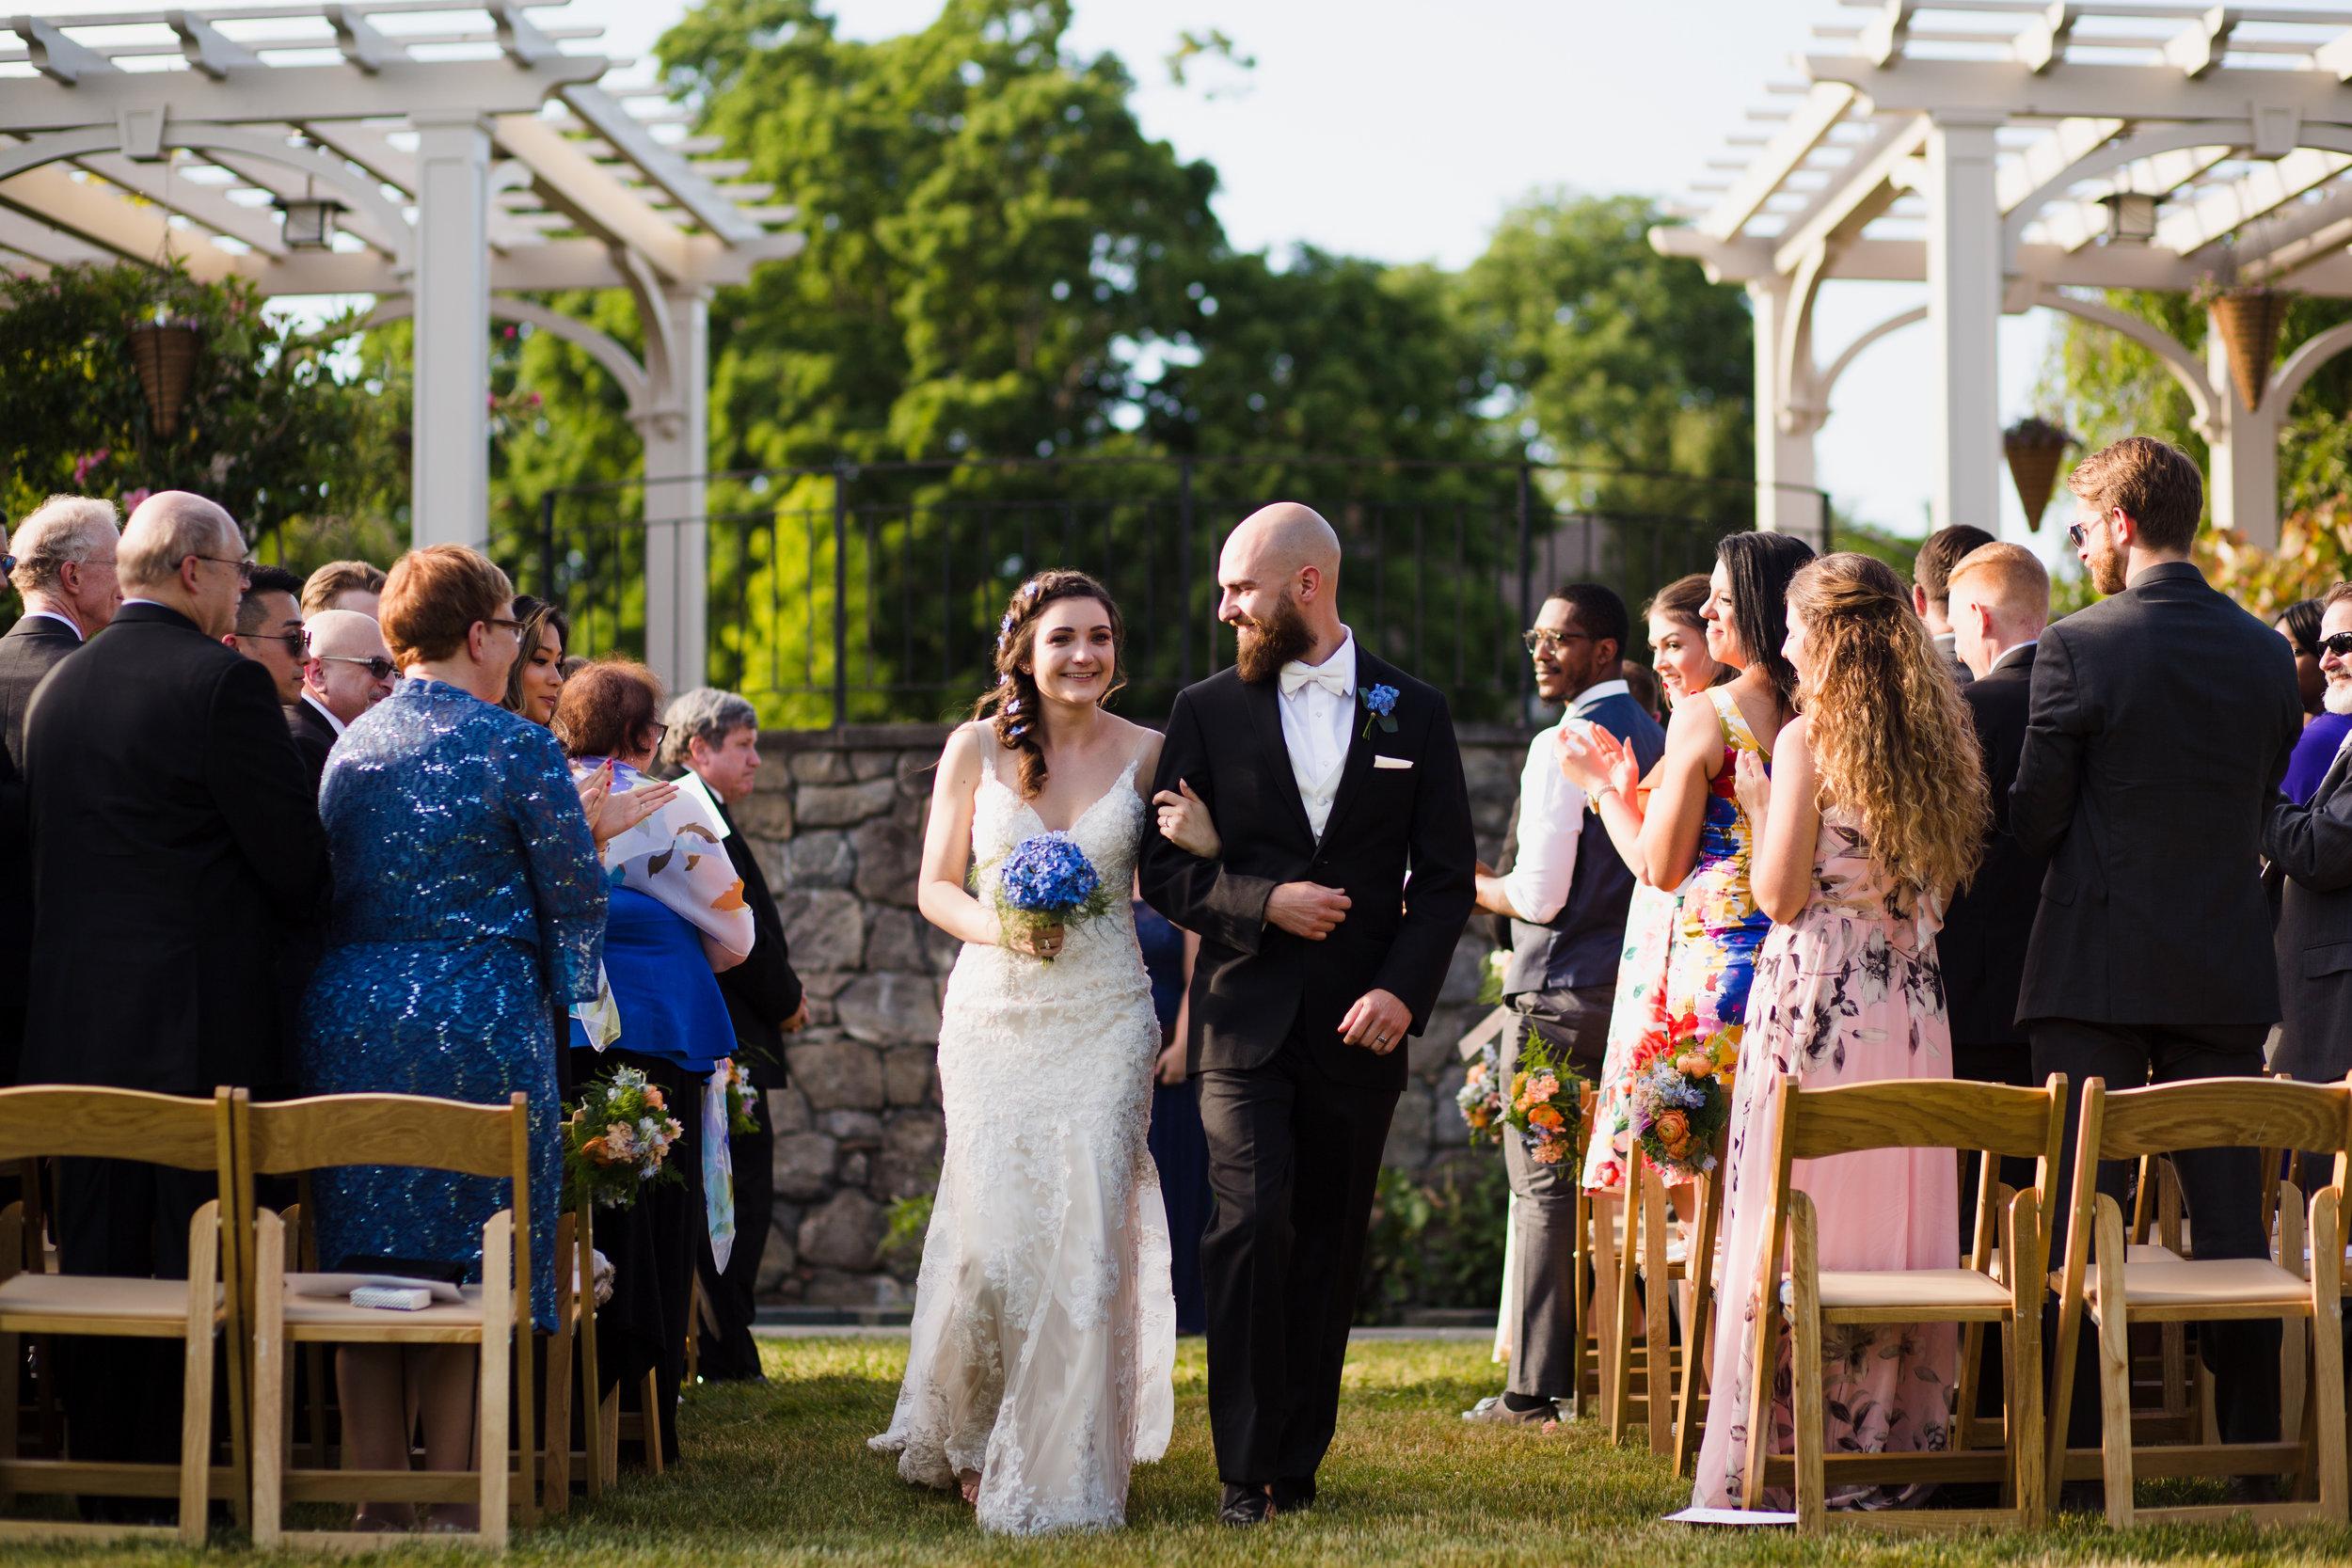 Tower-Hill-Botanic-Garden-Wedding-020.JPG